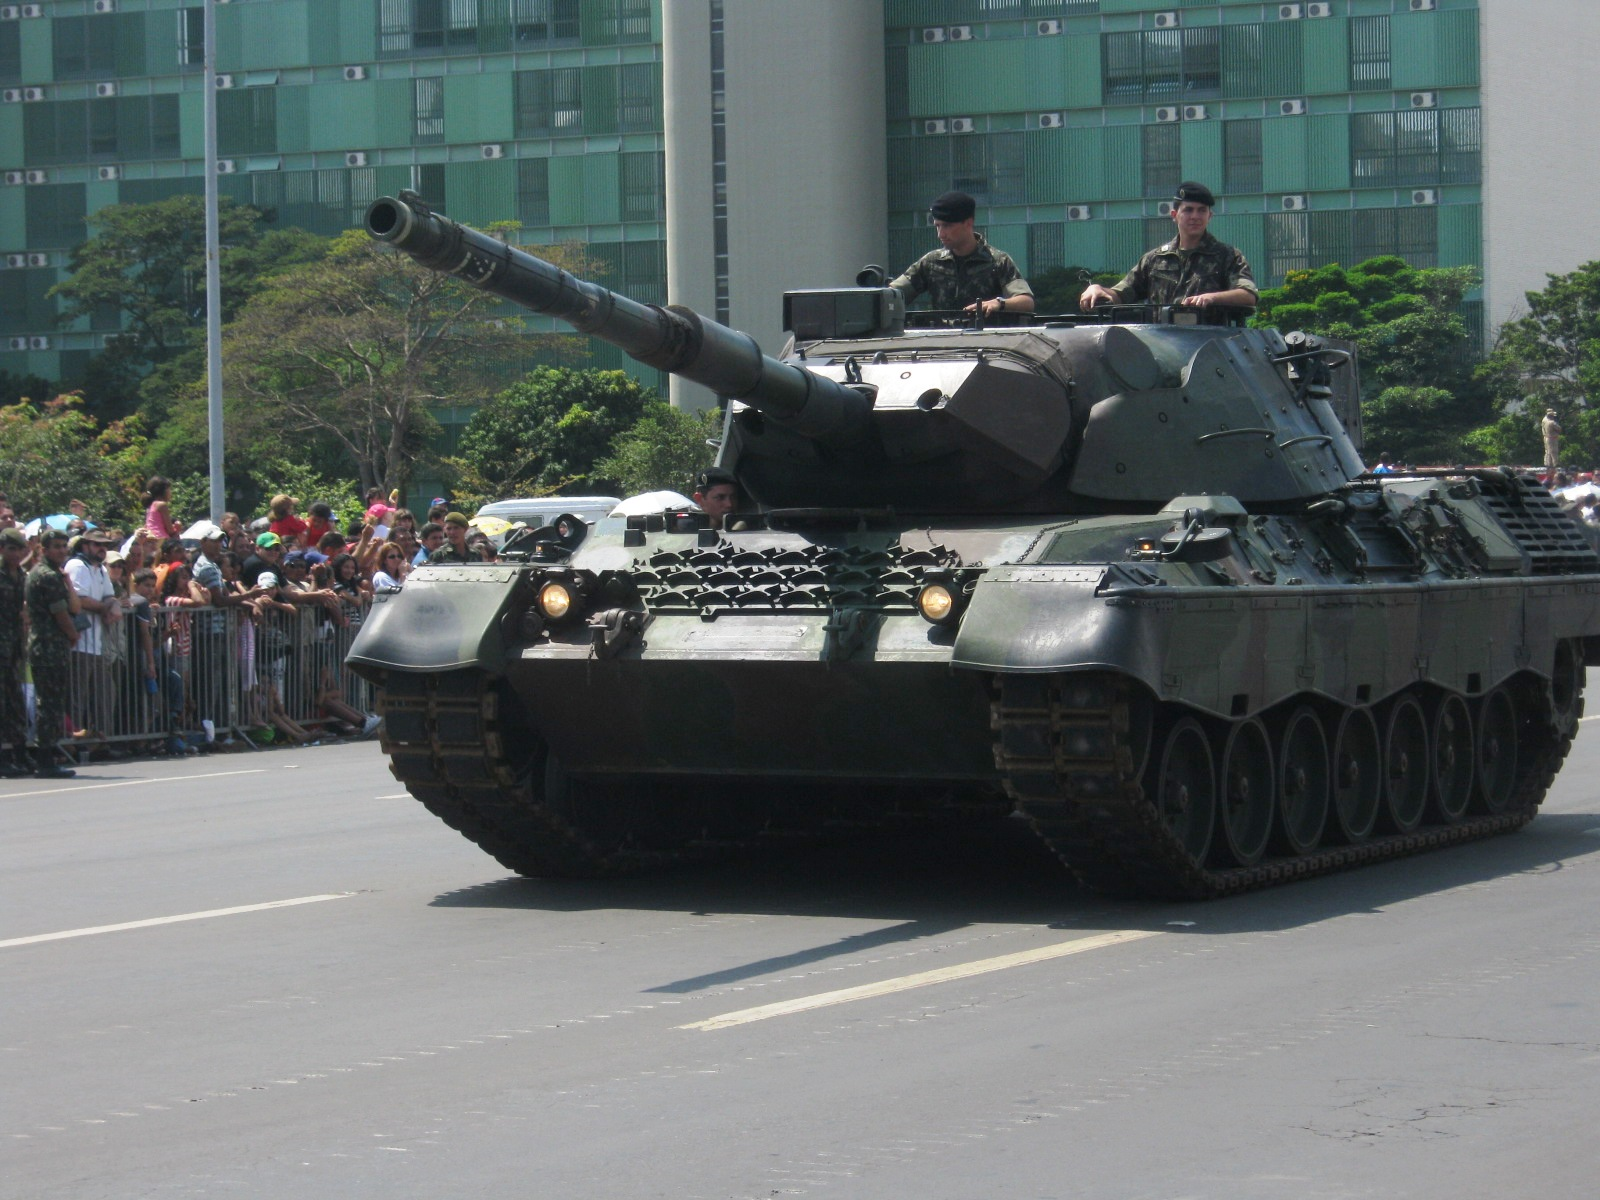 [Obrazek: Brazilian_Leopard_1_tank.jpg]